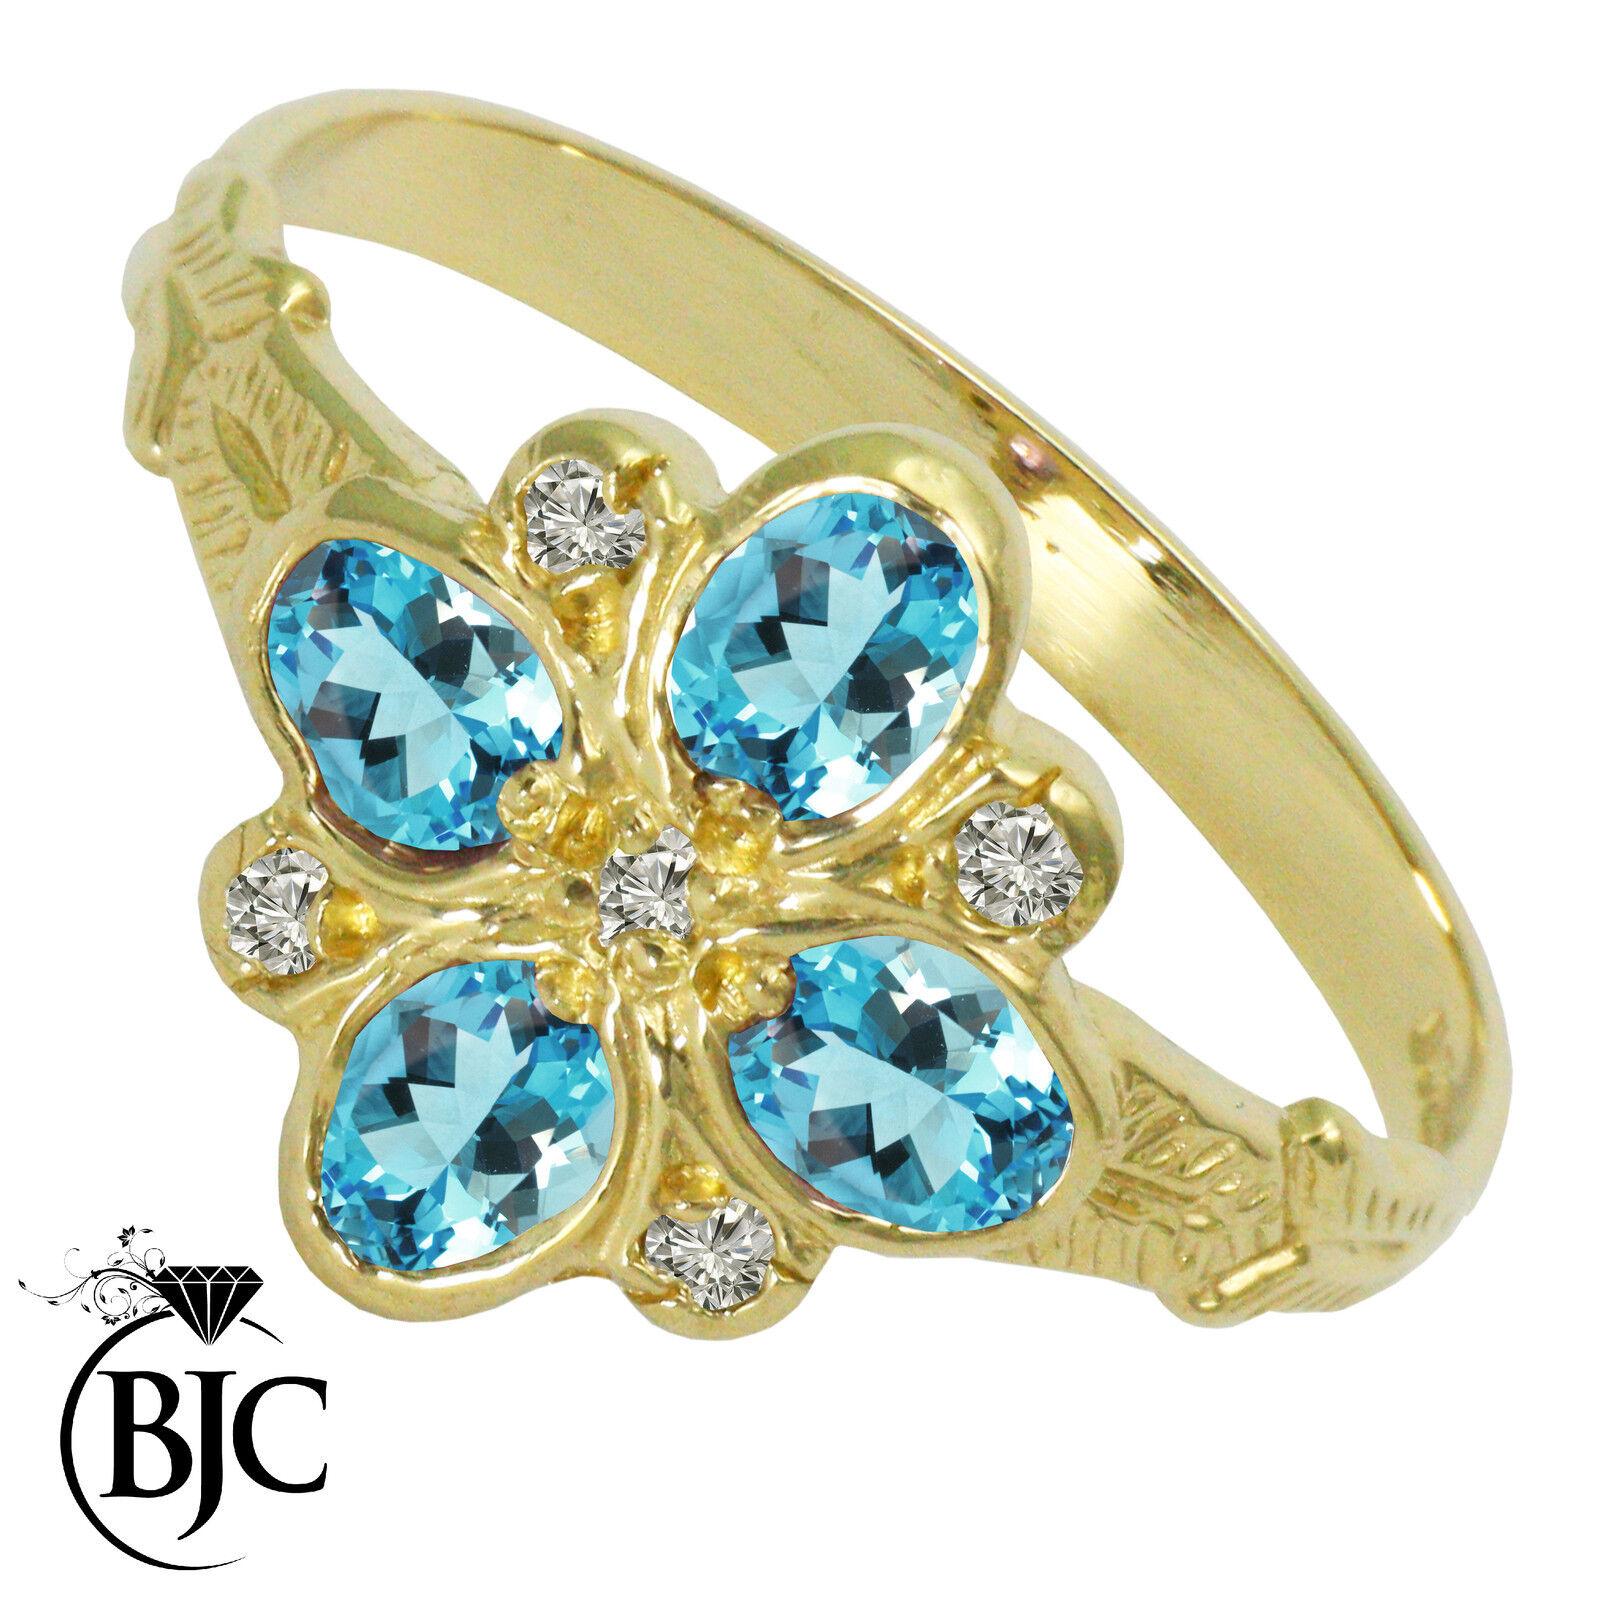 Bjc 9 Karat yellowgold bluee Topas & Diamant Art Déco Größe O Verlobungsring R204